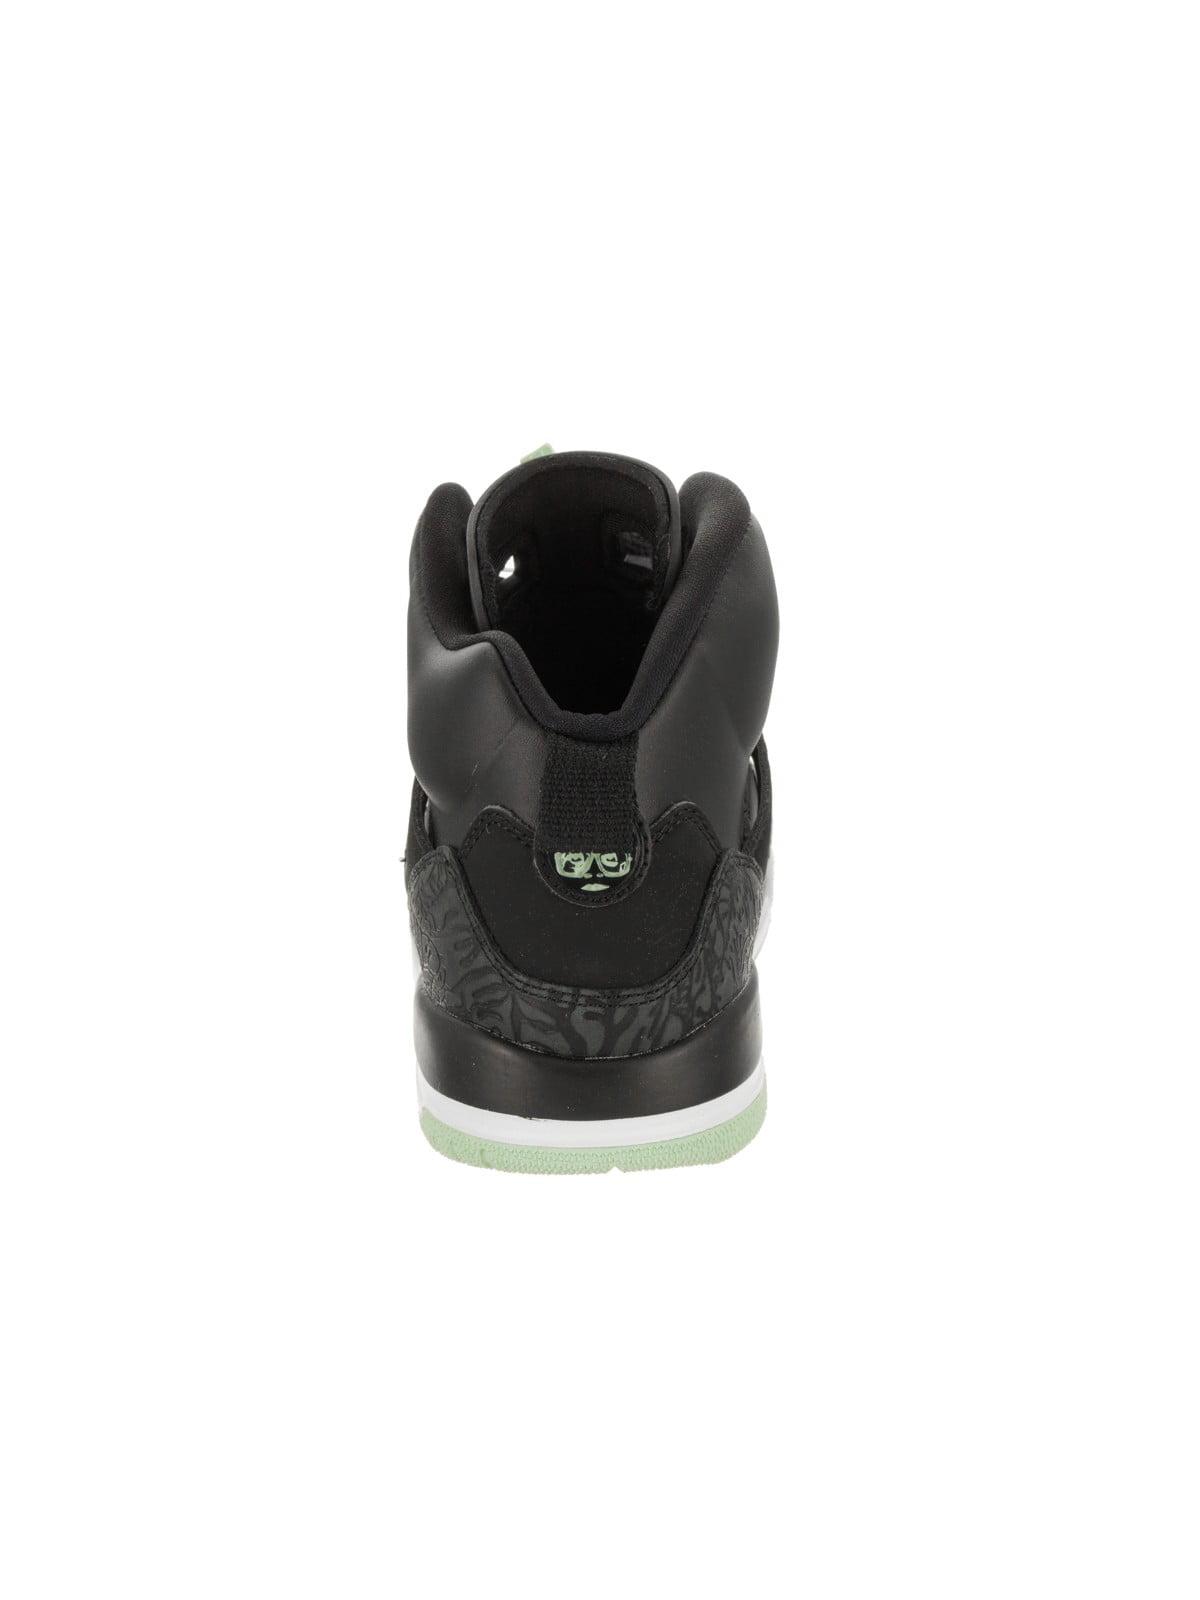 30aa413c62d8fb Jordan - Kids Air Jordan Spizike GS Black Mint Foam Dark Grey White 535712- 015 - Walmart.com